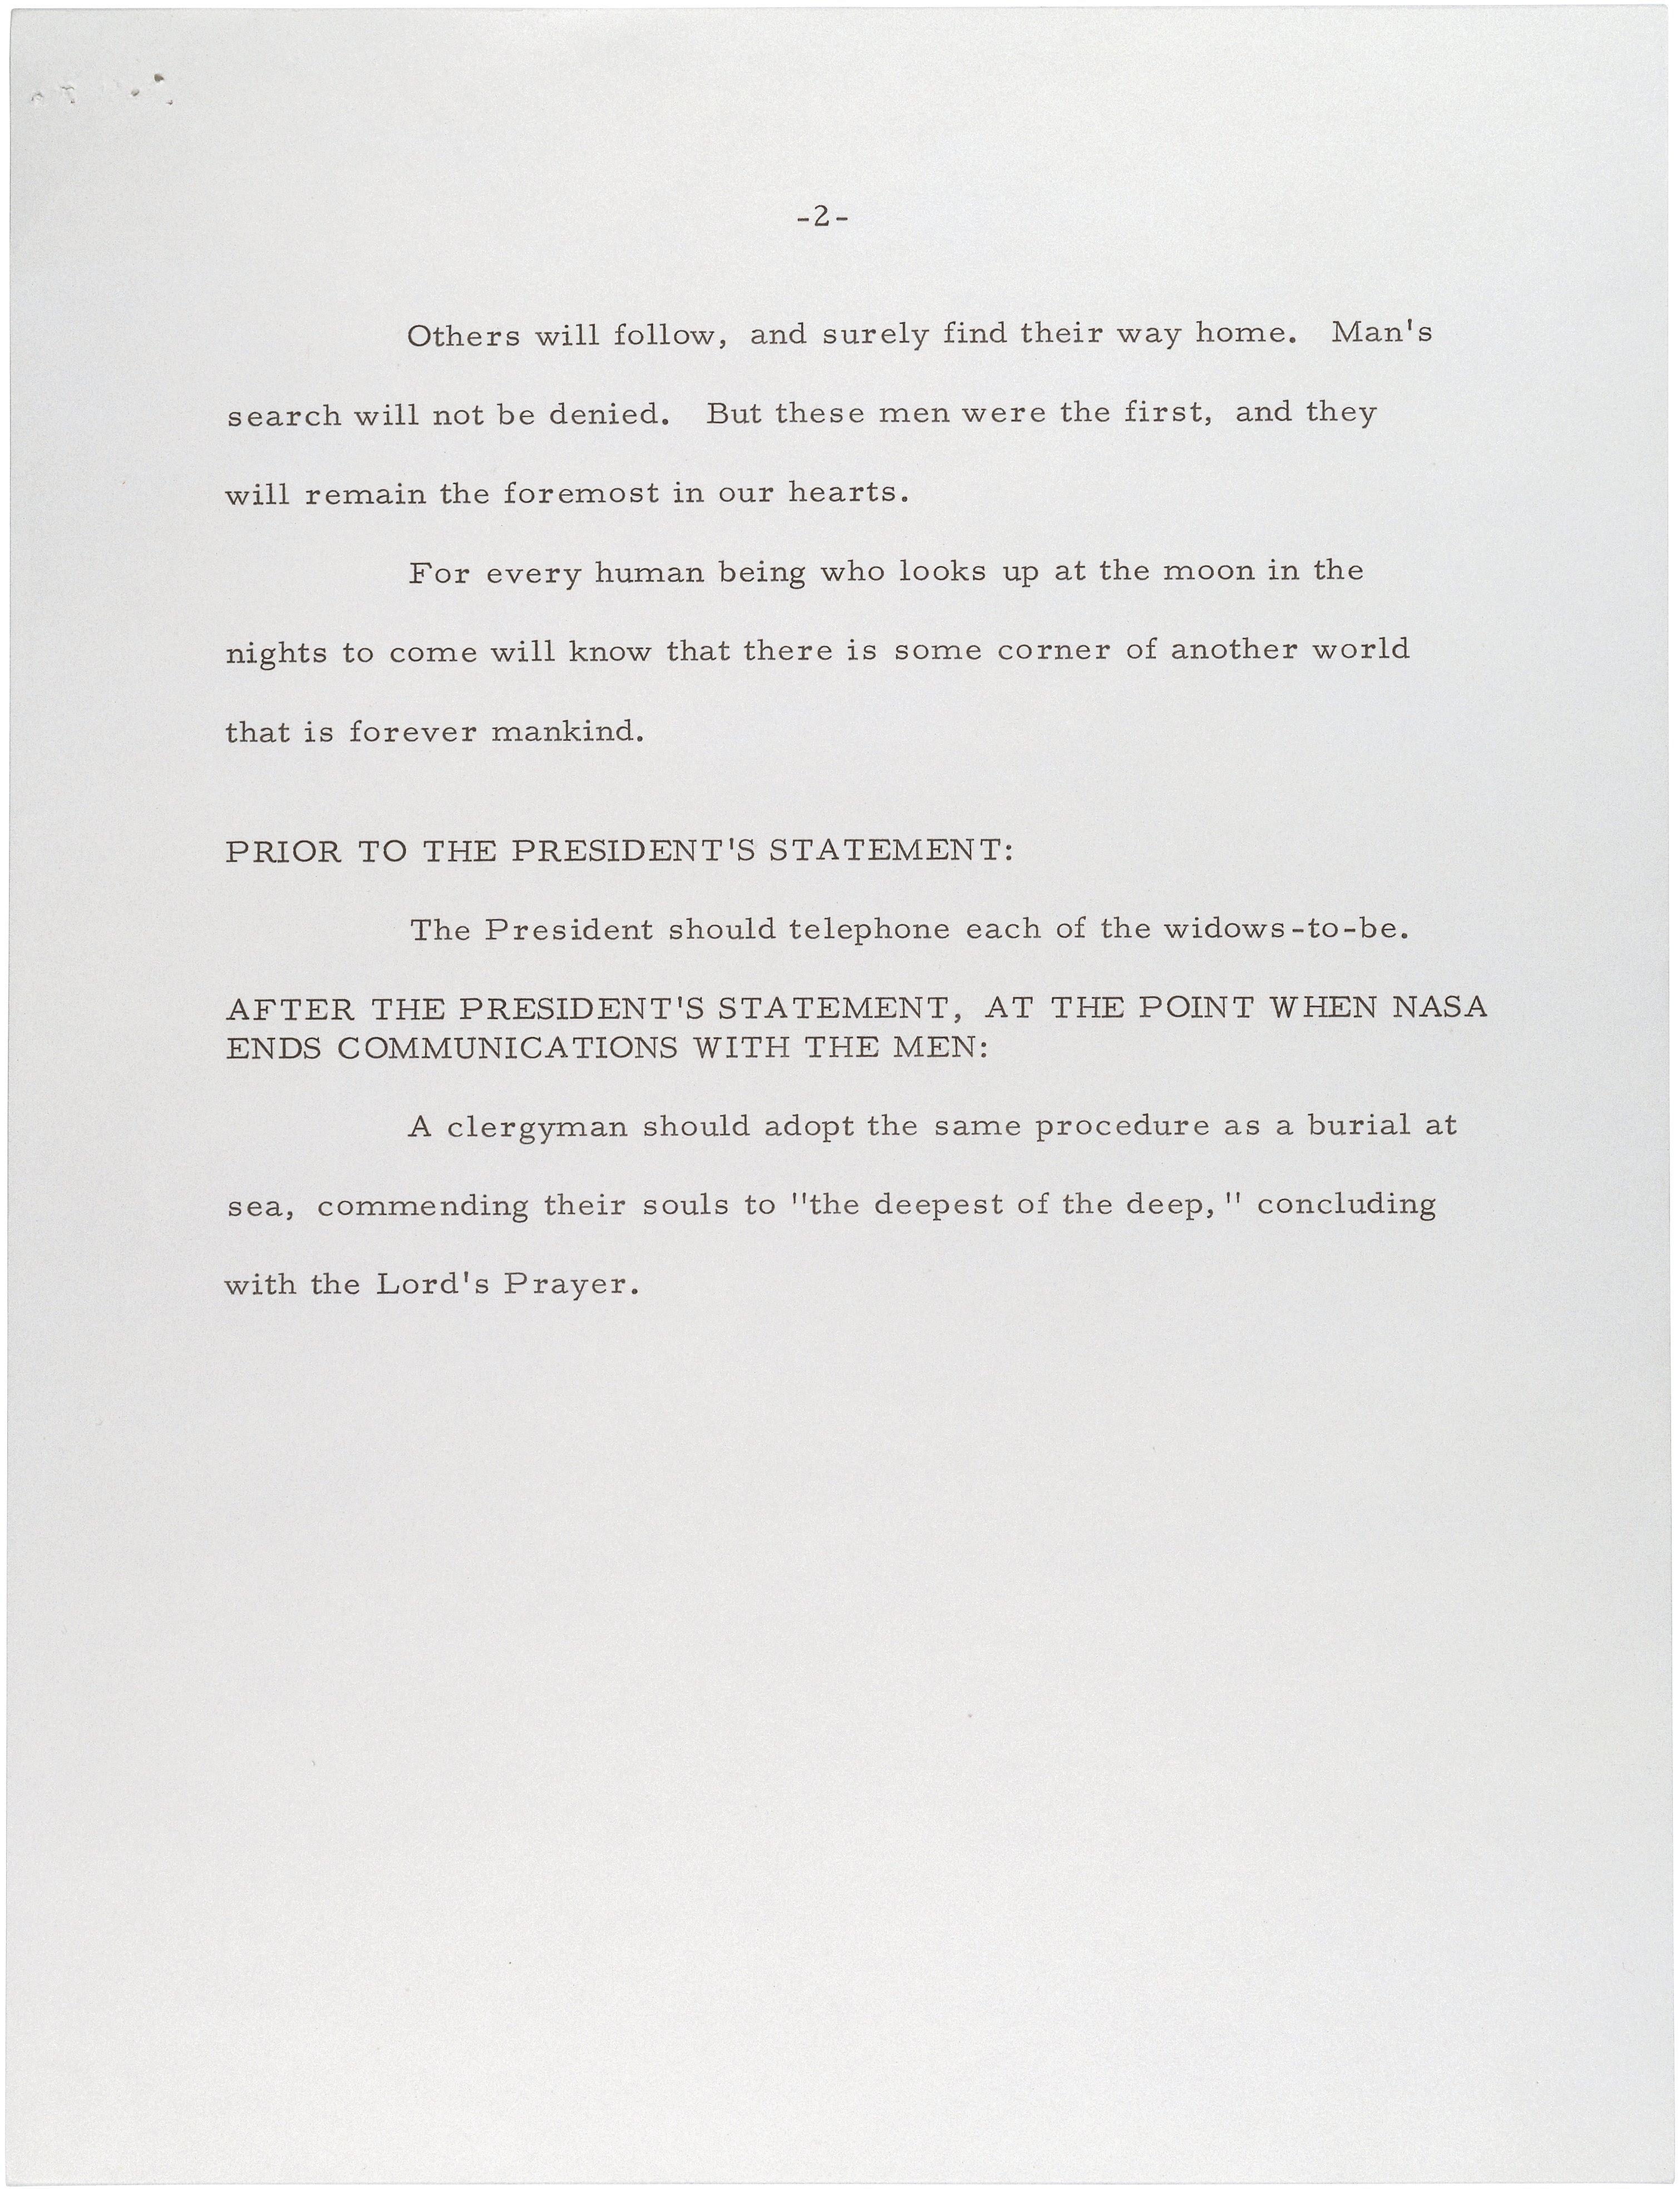 http://www.archives.gov/press/press-kits/american-originals-photos/moon-disaster-2.jpg